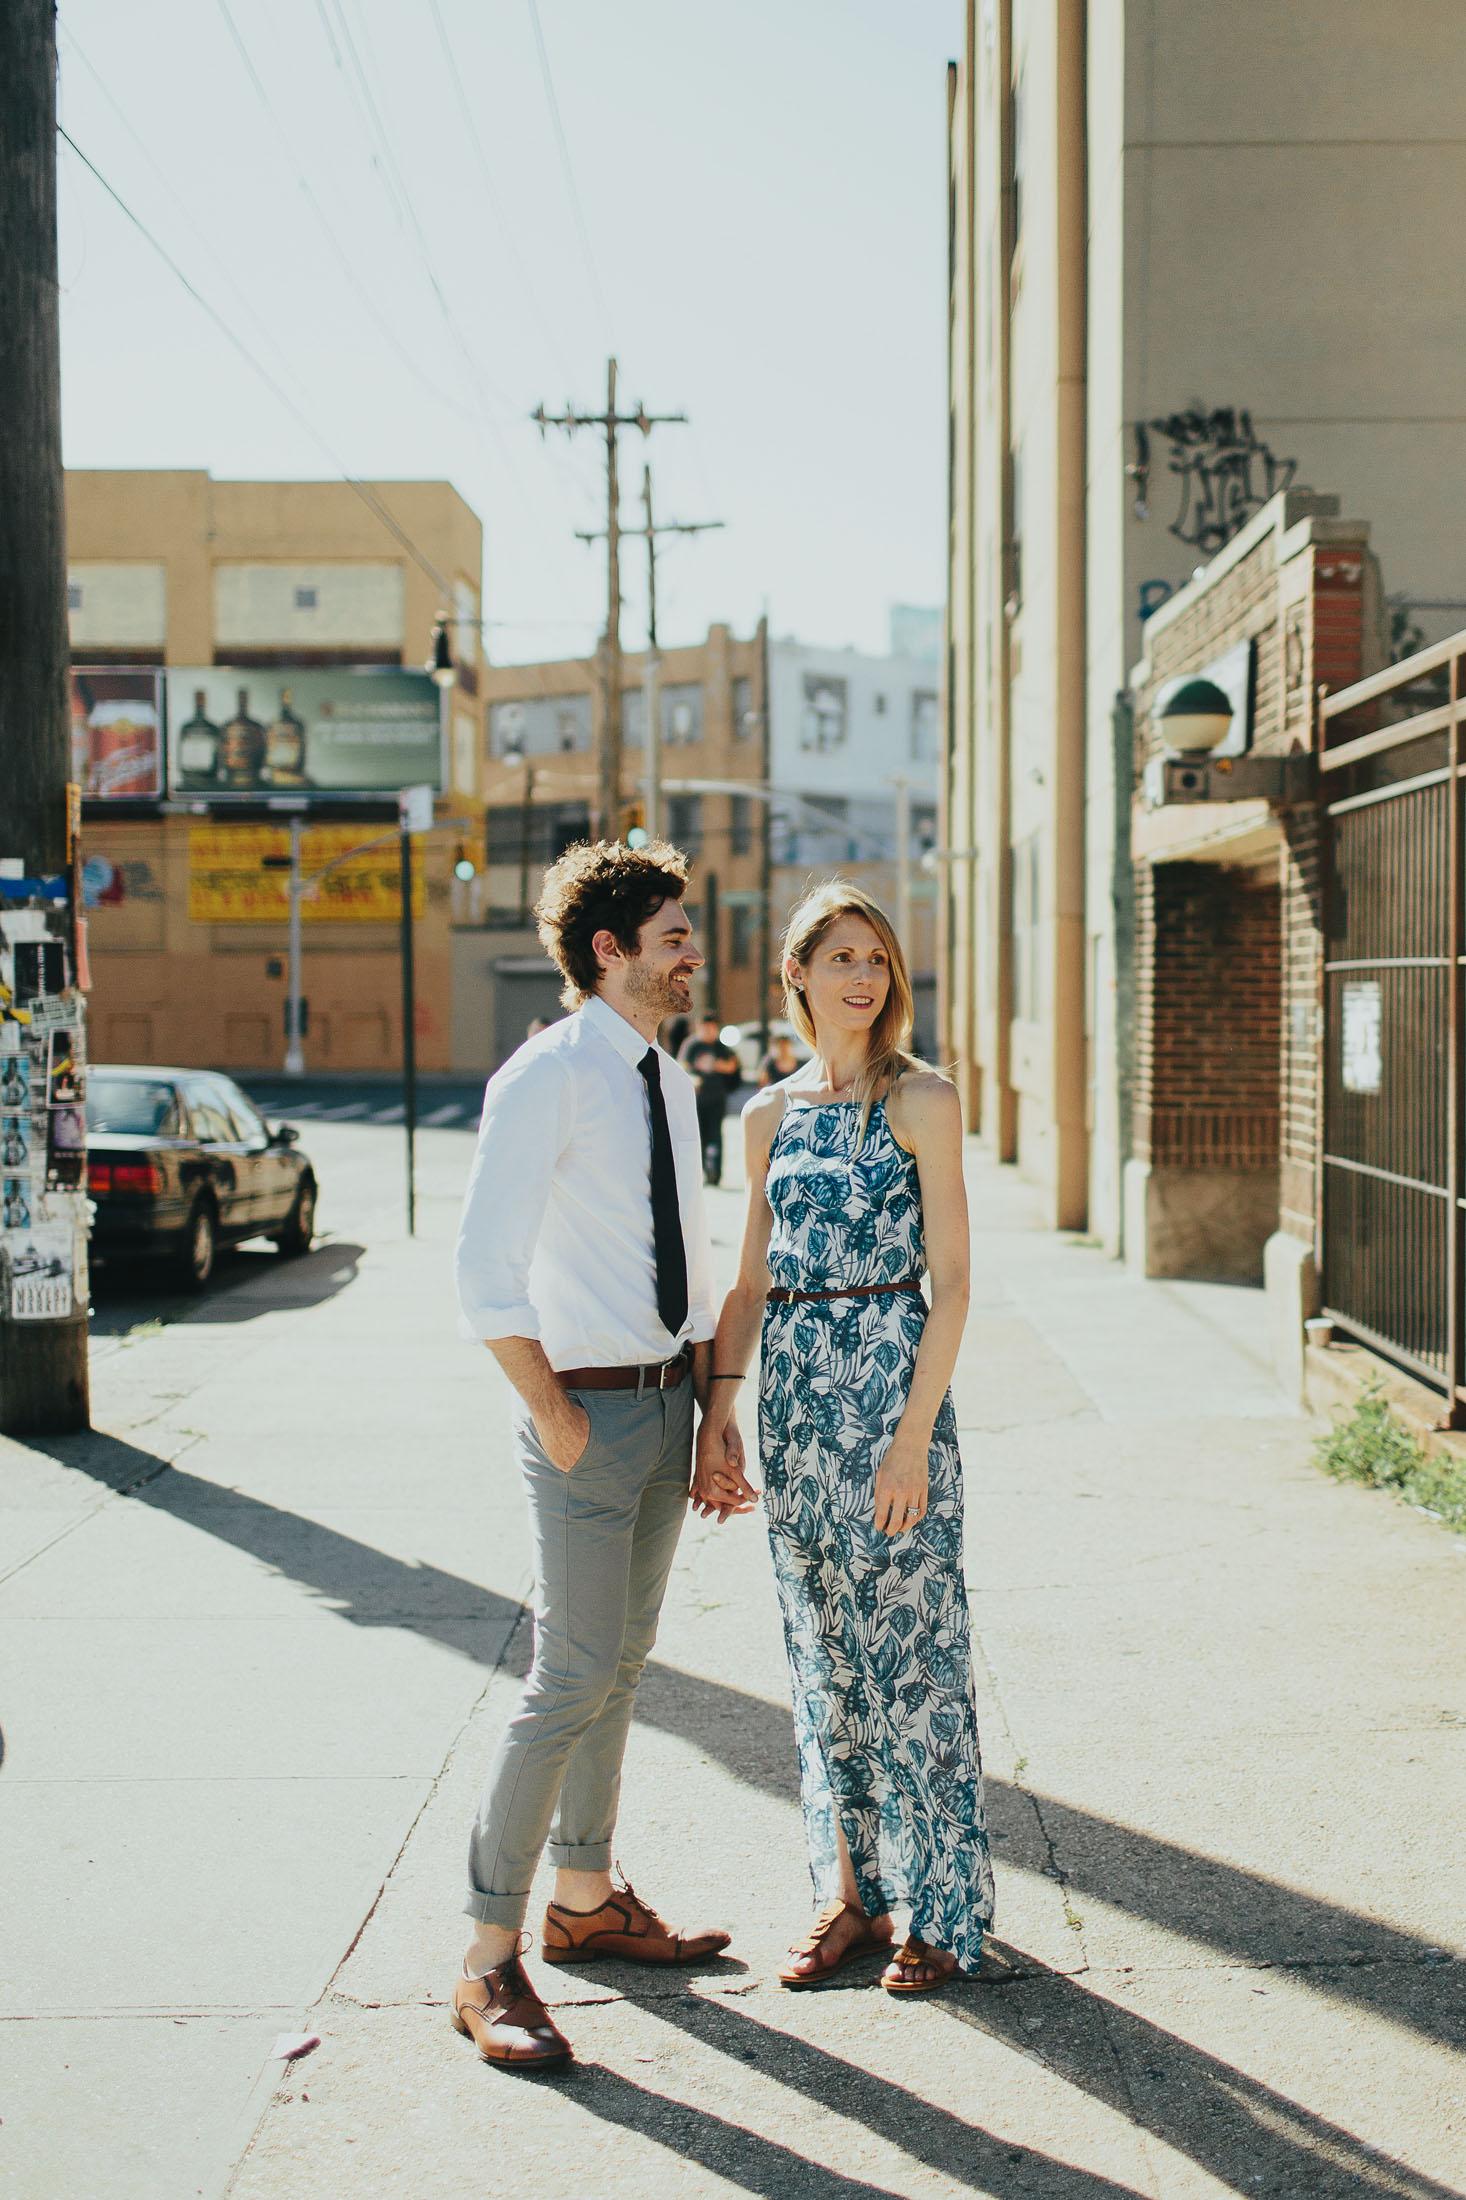 25 finch and oak engagement wedding photographer gold coast new york brooklyn.jpg